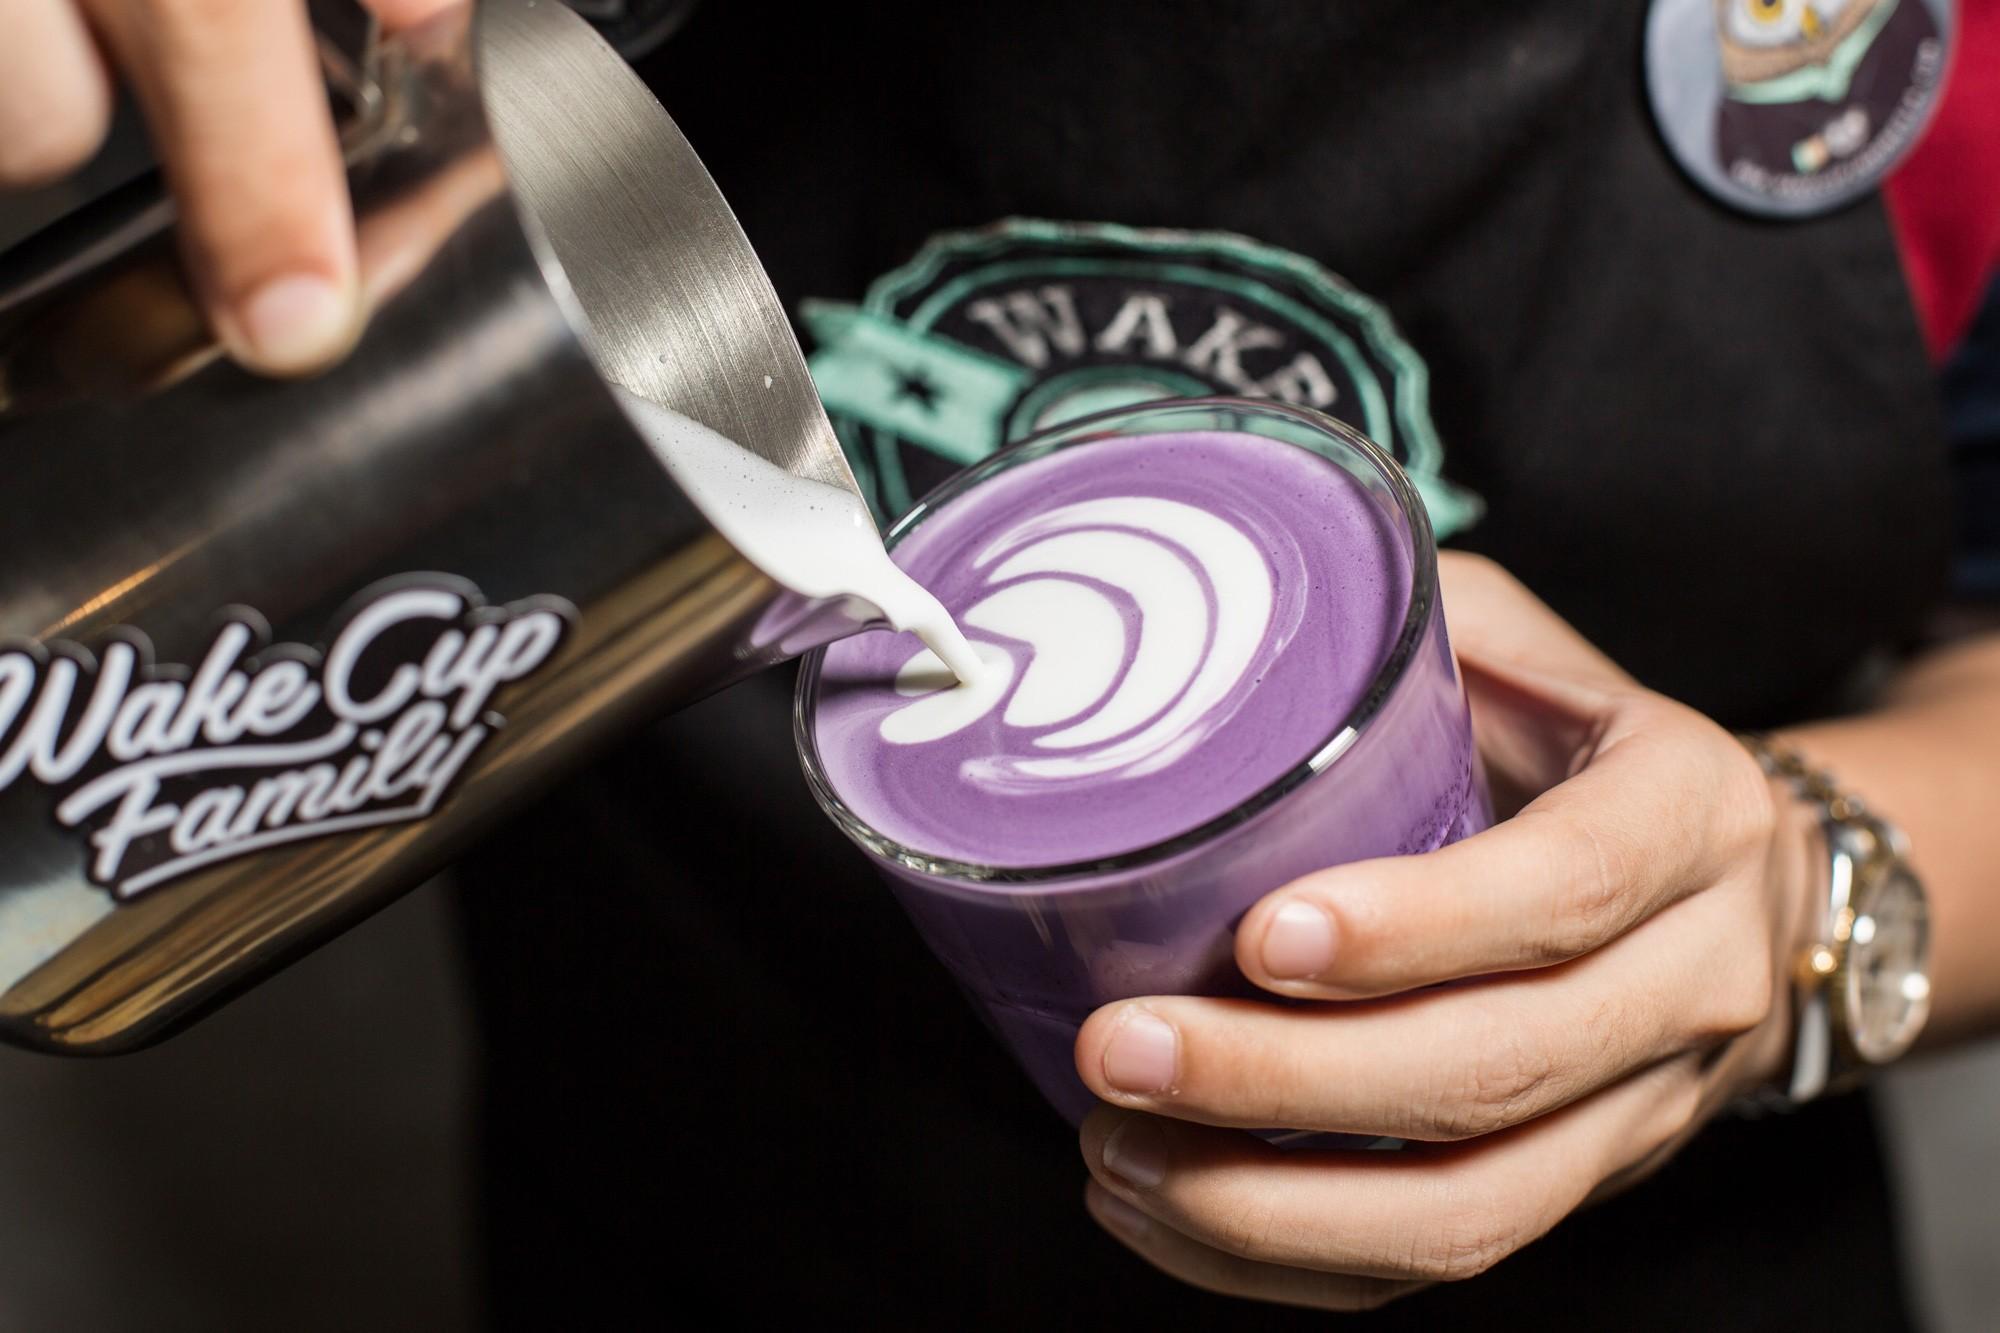 Wake Cup Coffee Eatery Linkedin